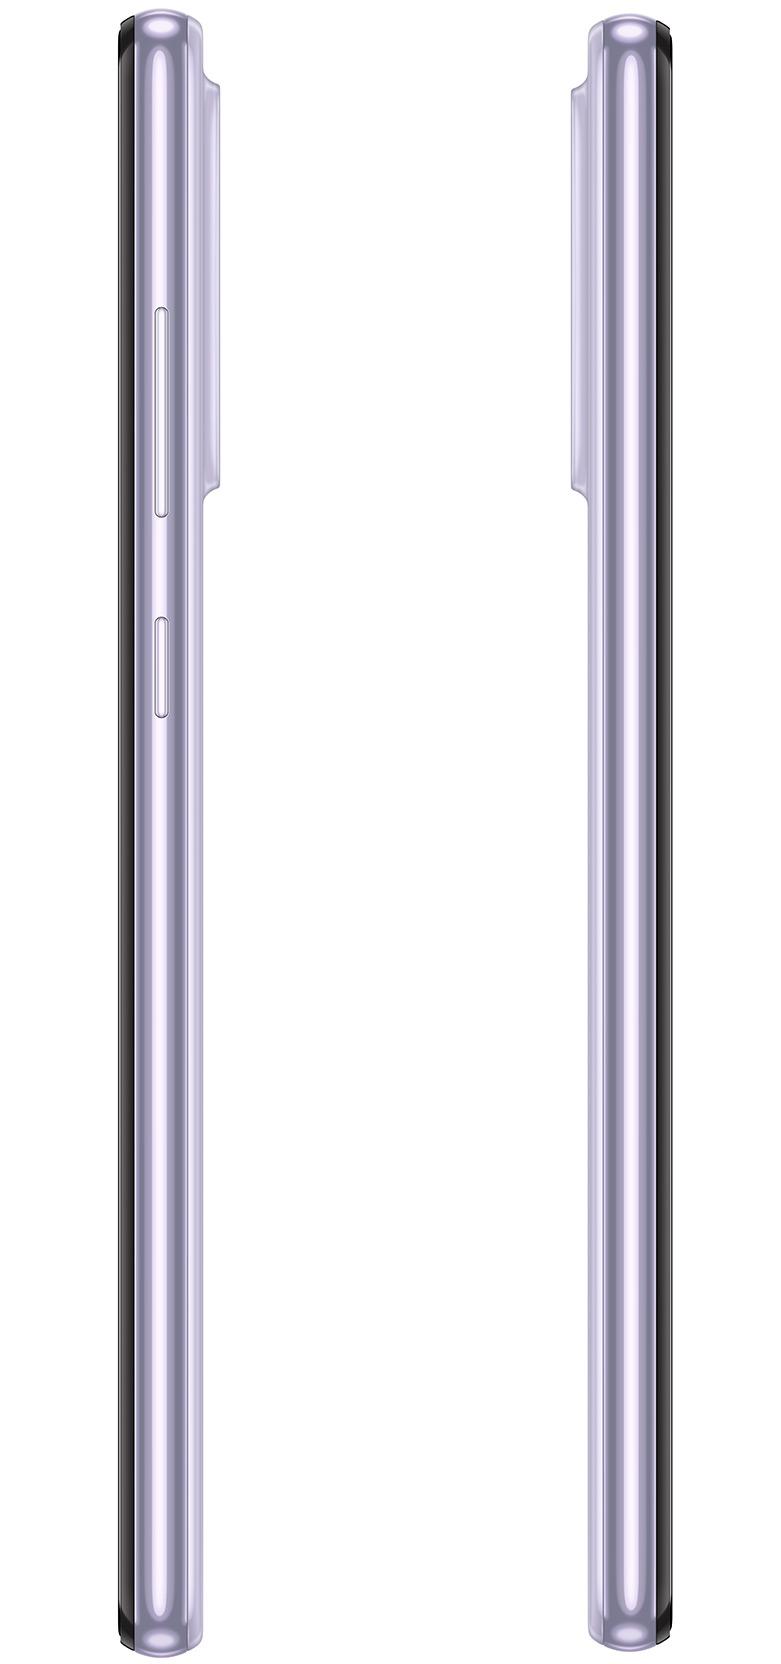 Samsung Galaxy A72 DS (SM-A725) 256GB Violet - 5